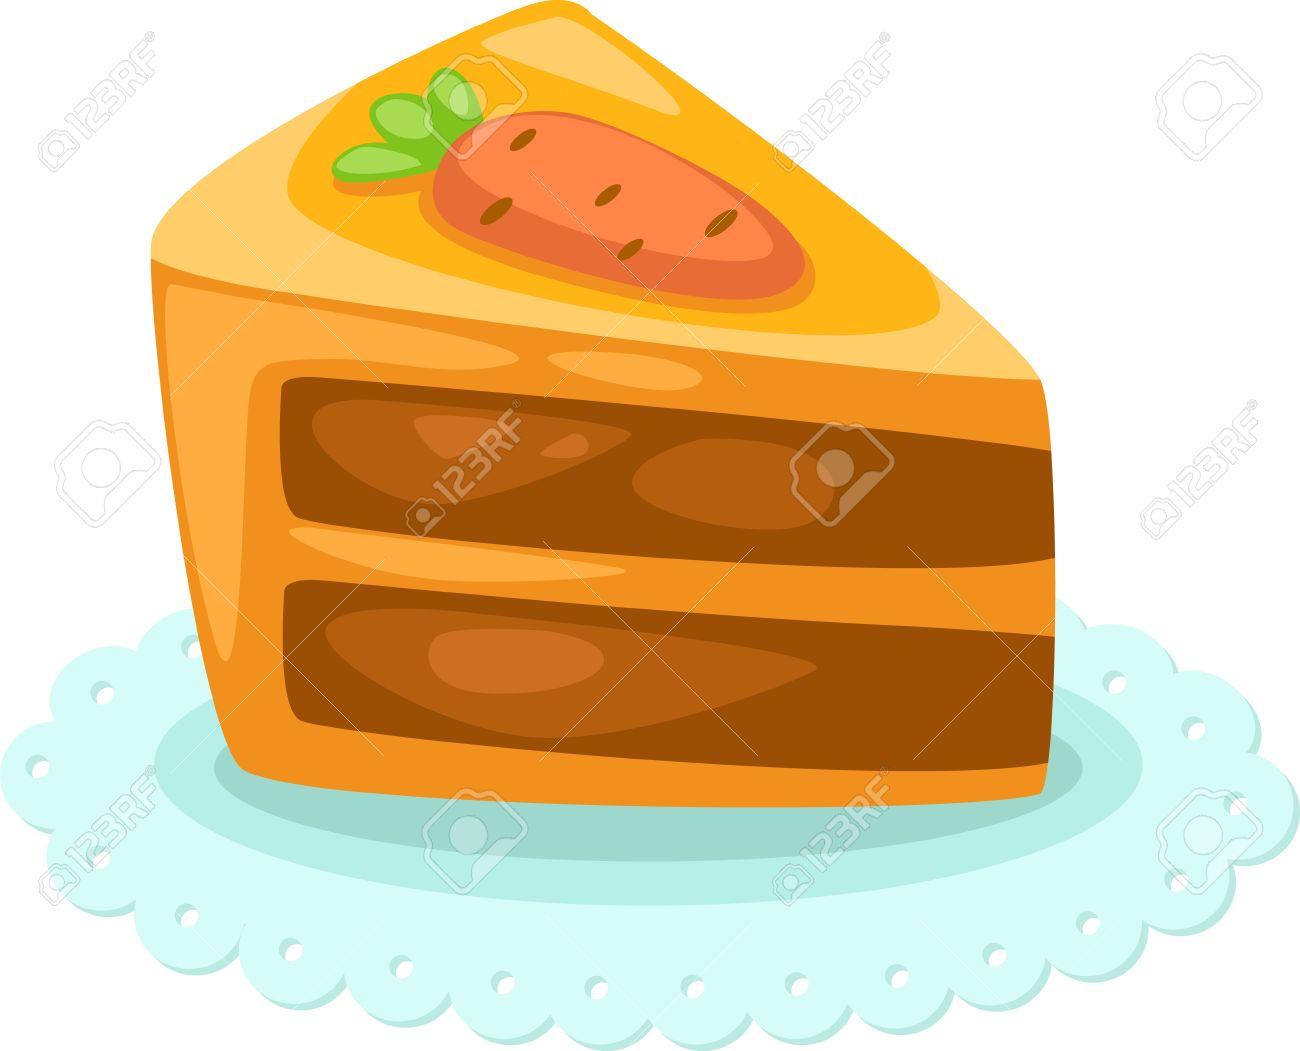 cake vector illustration - 15454357